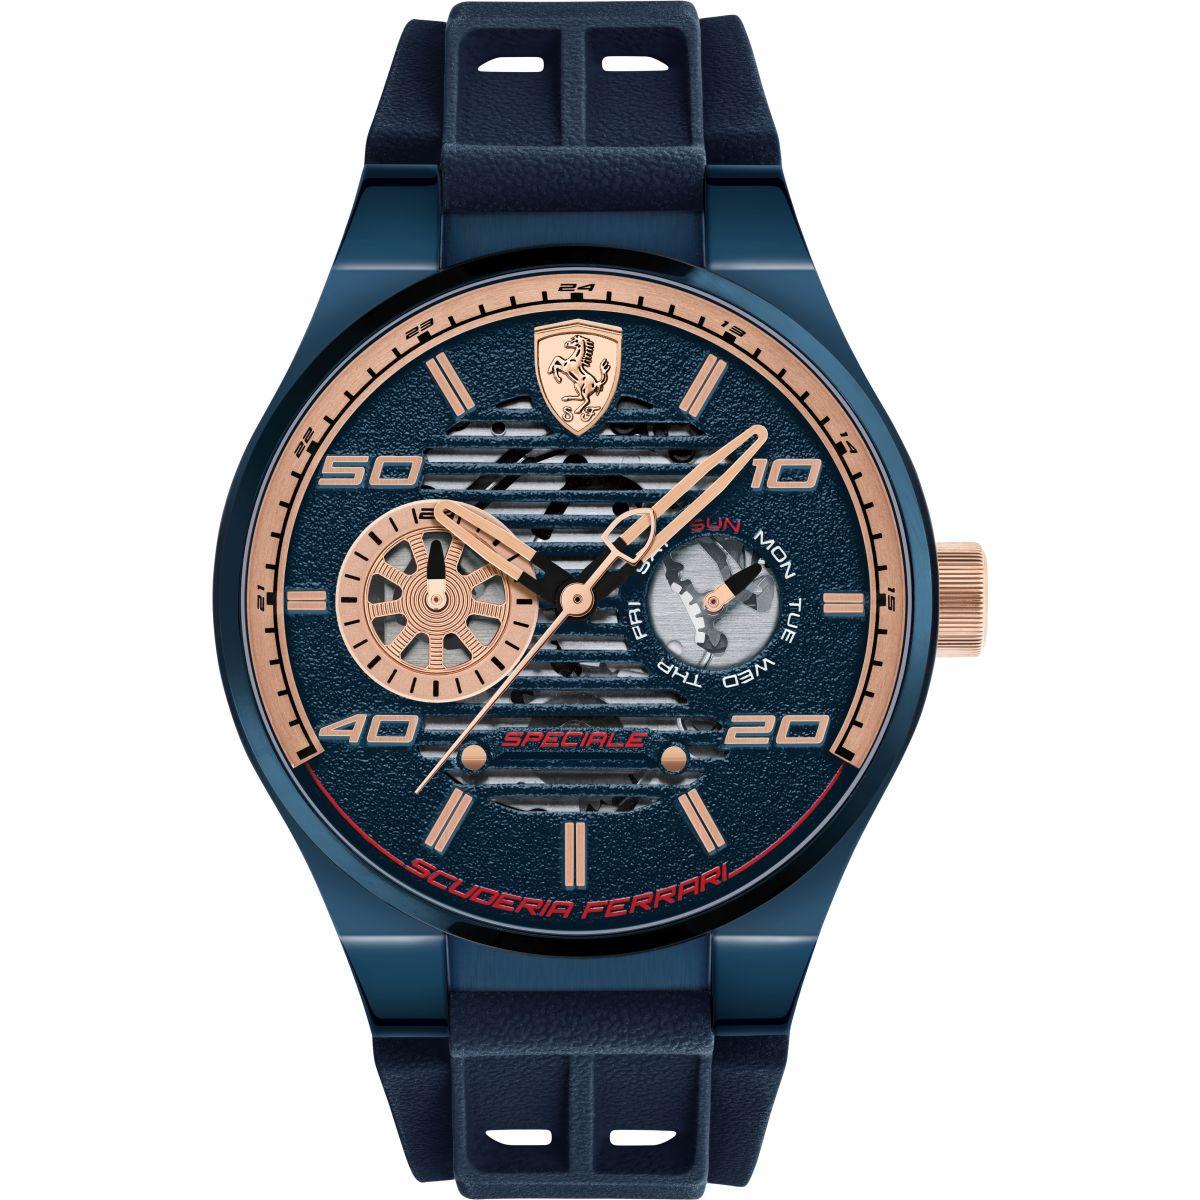 for strap lyst multi men sale speciale ferrari mens s watches watch black accessories leather